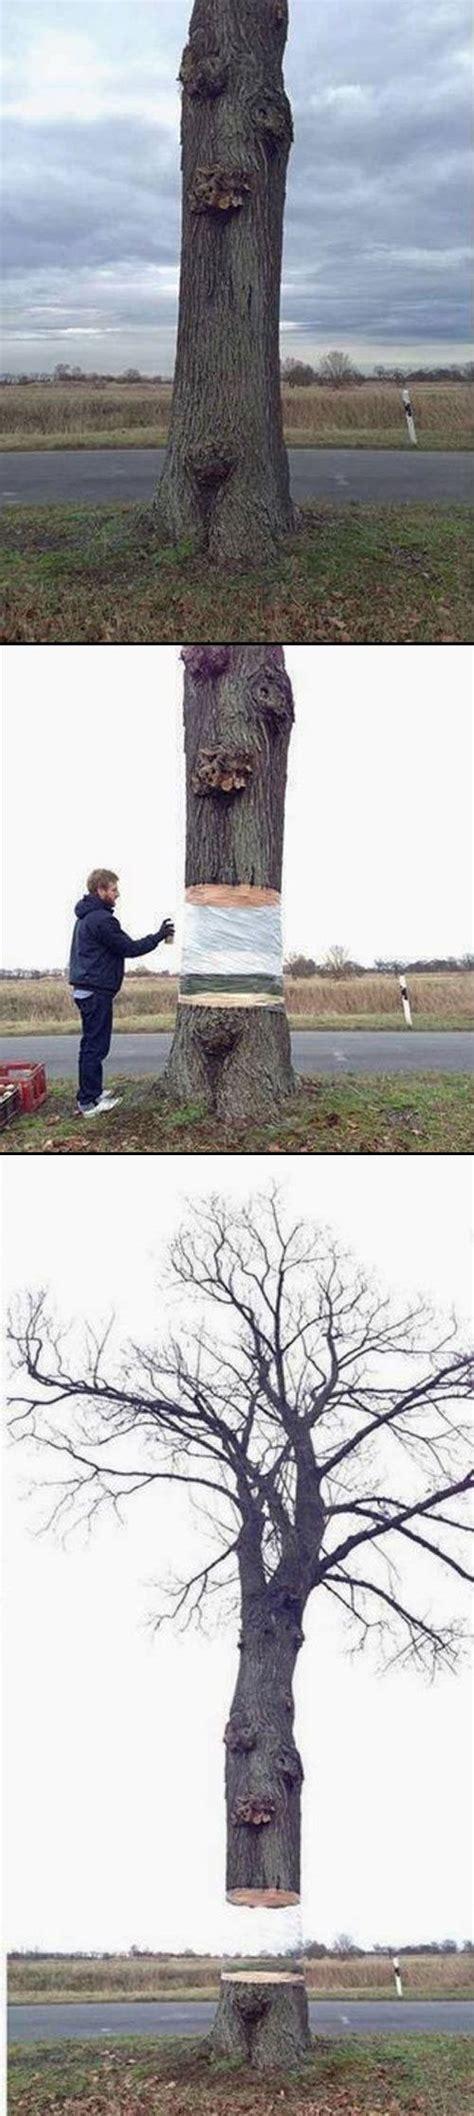 ilusiones opticas concepto since when can trees float chistes ilusiones 243 pticas y